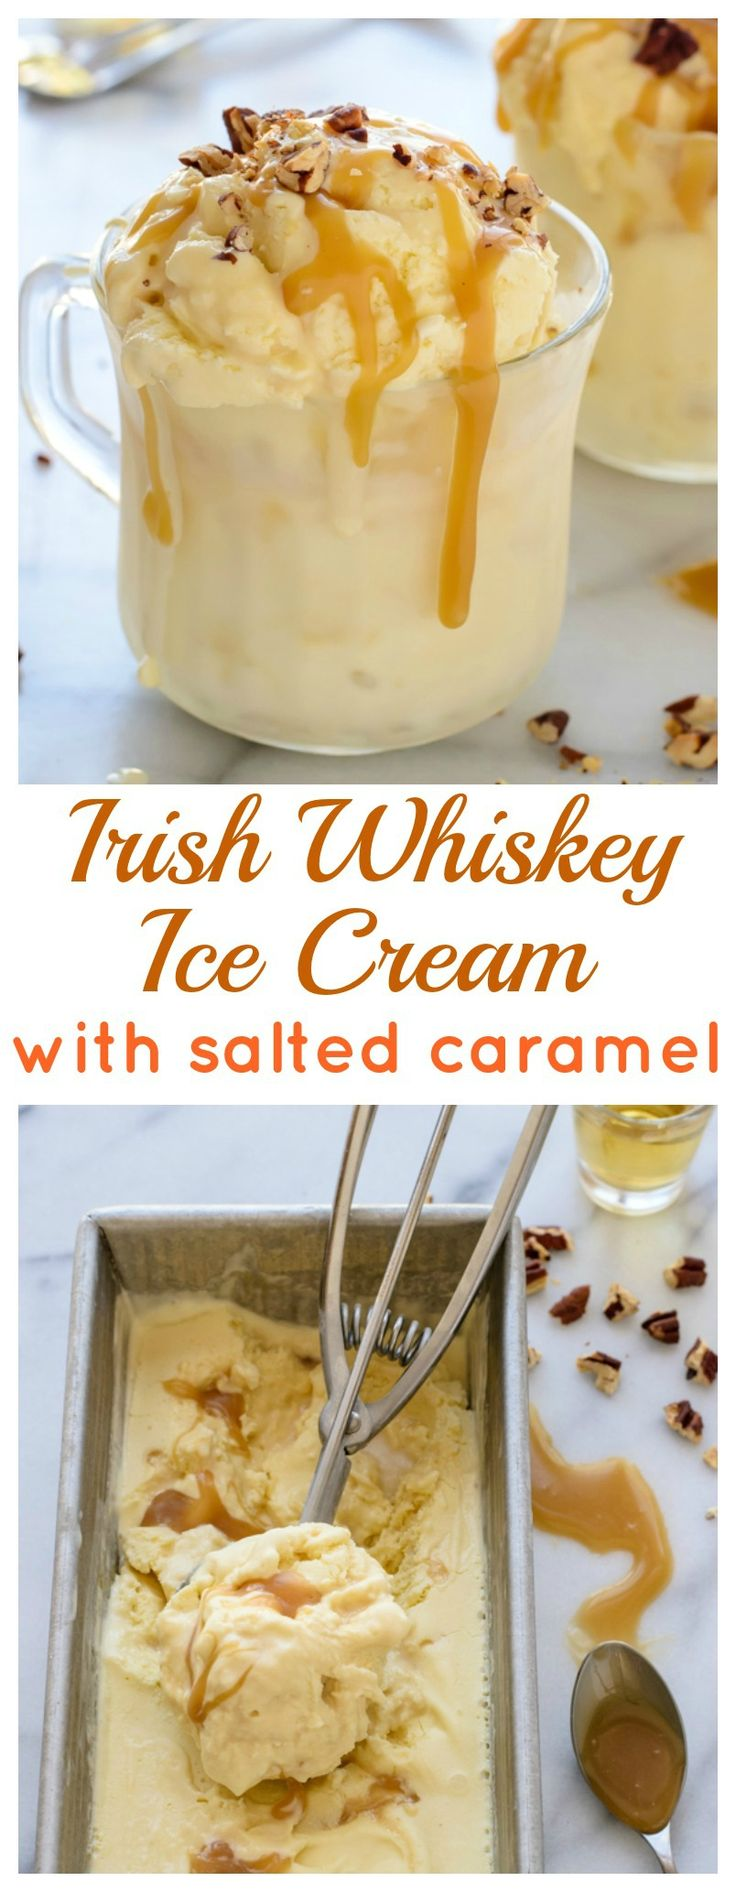 Irish Whiskey Ice Cream with Salted Caramel Sauce. Warning:  it's BOOZY.